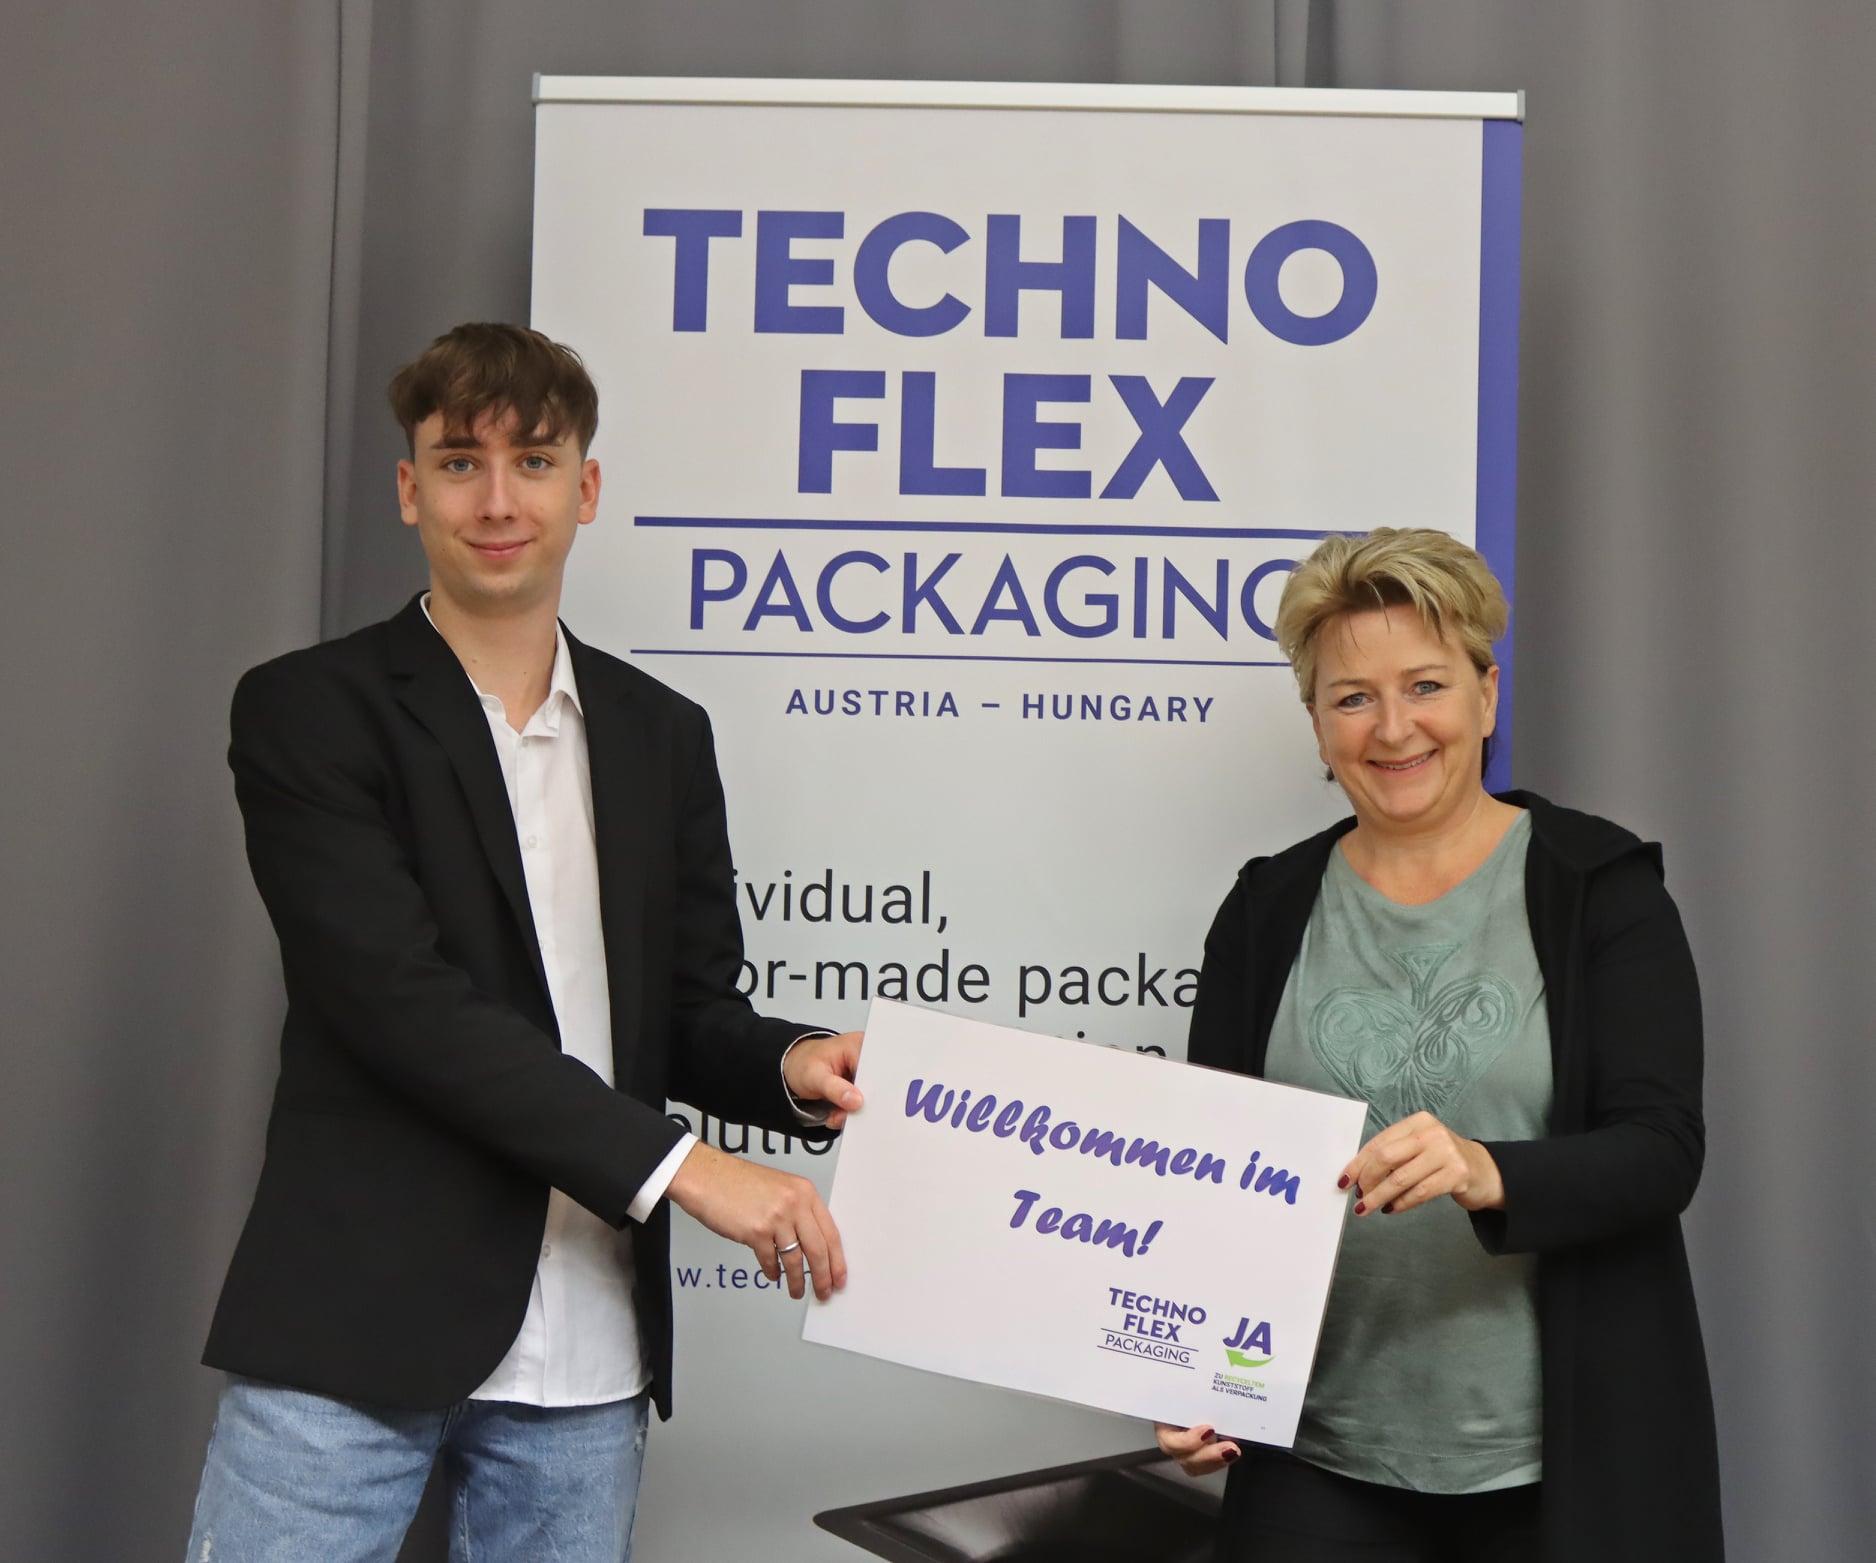 Lehrling Technoflex Verpackungen